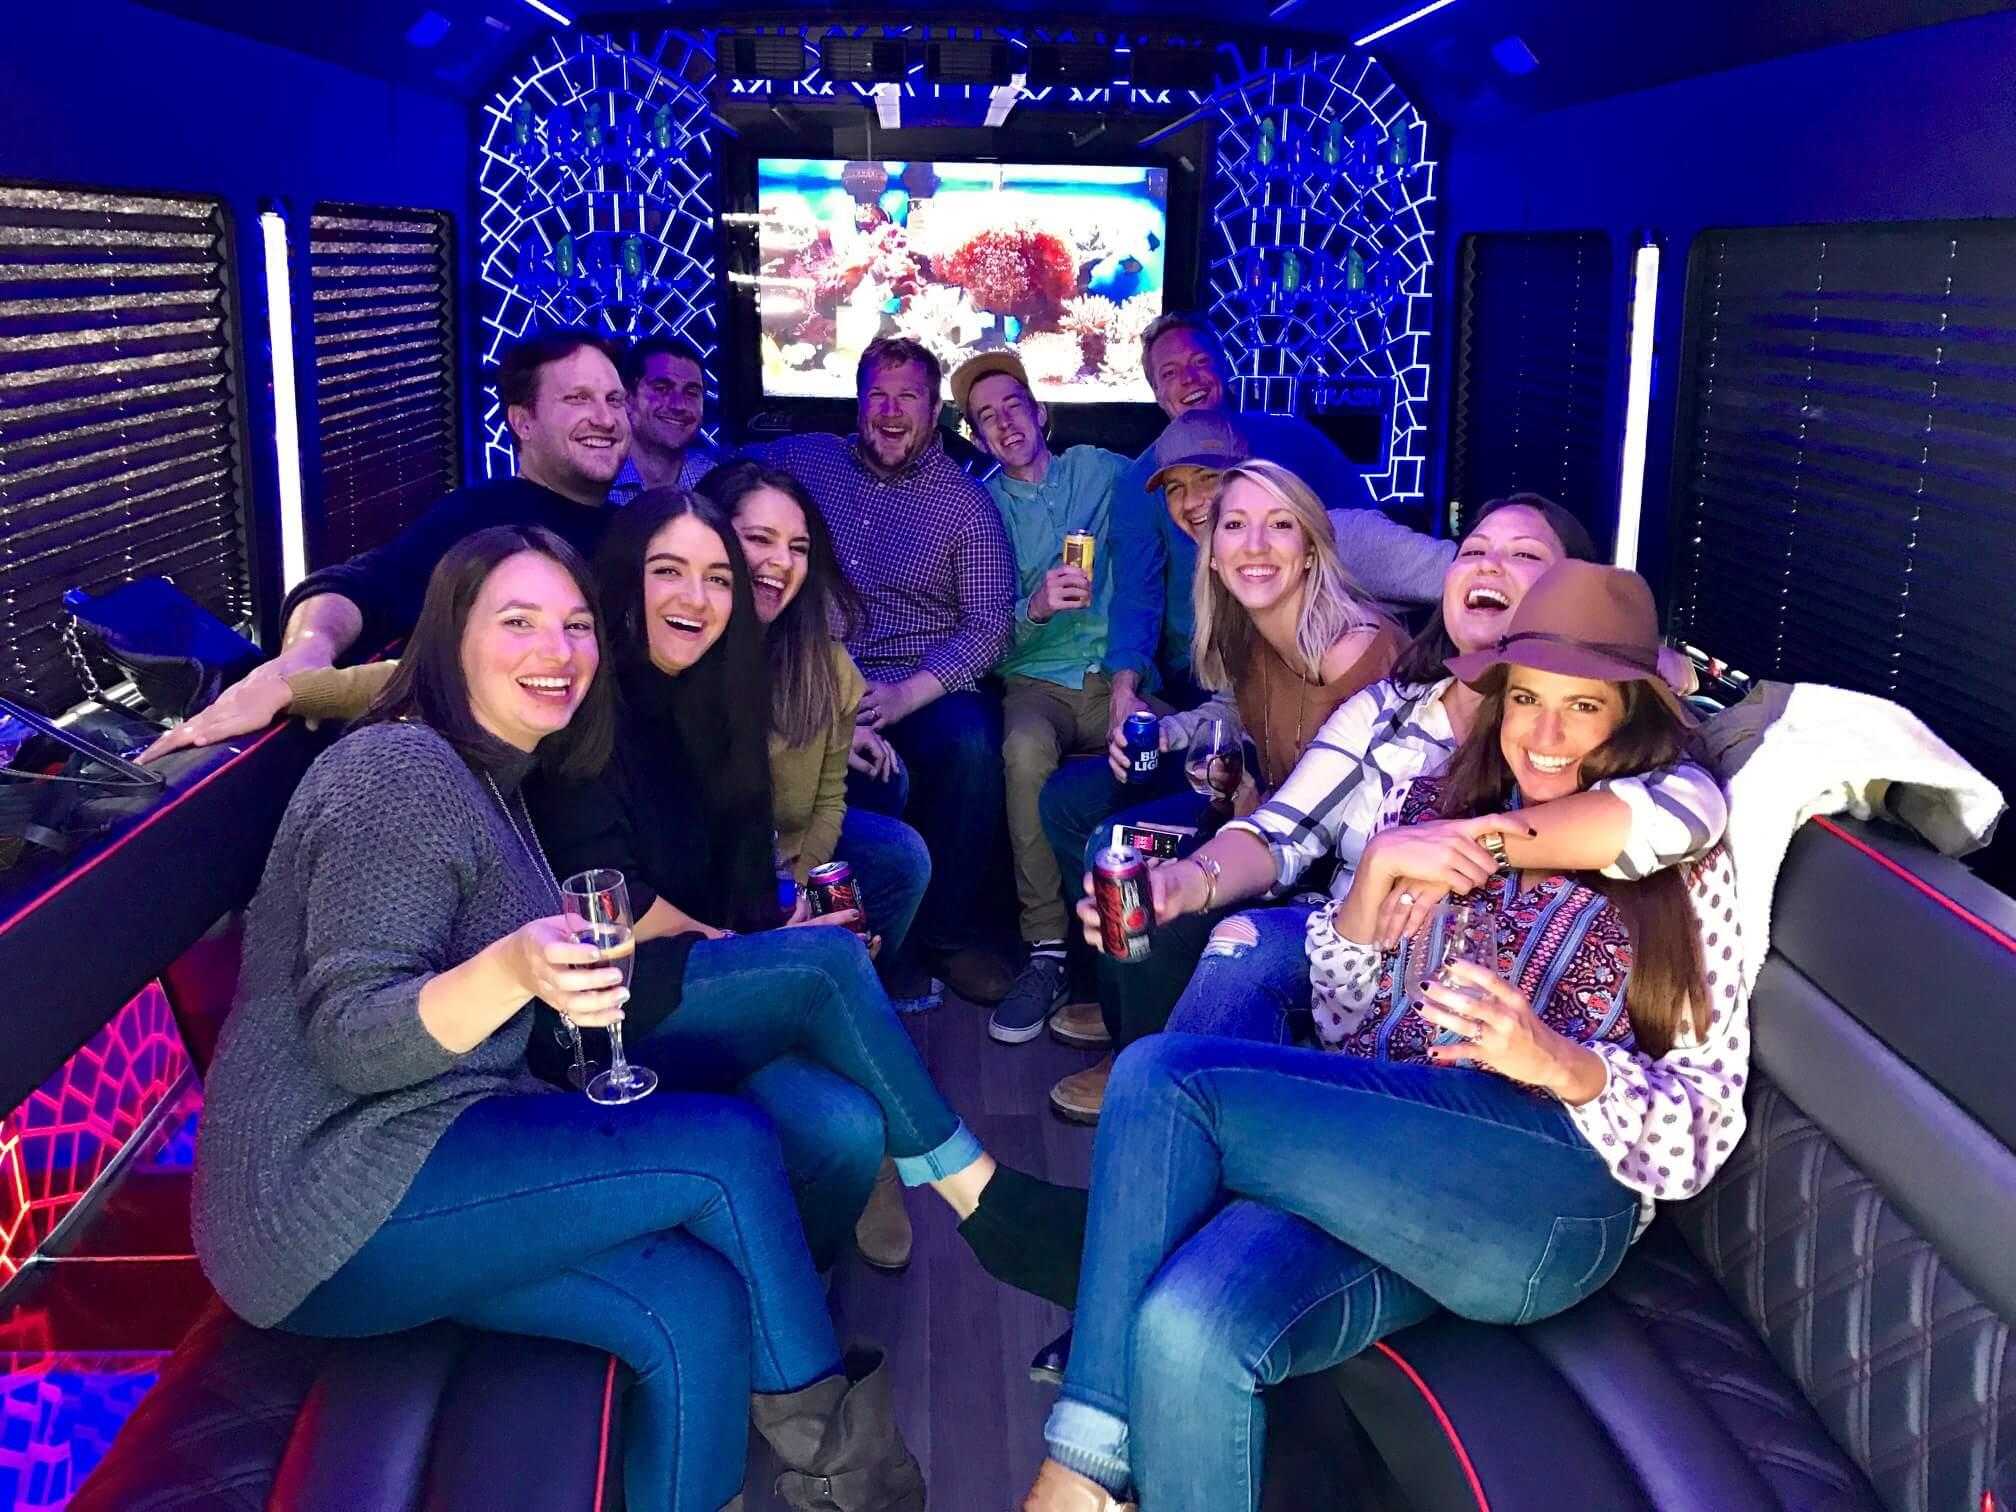 Vegas Rockstar Nightclub Tour : Things to do in Las Vegas